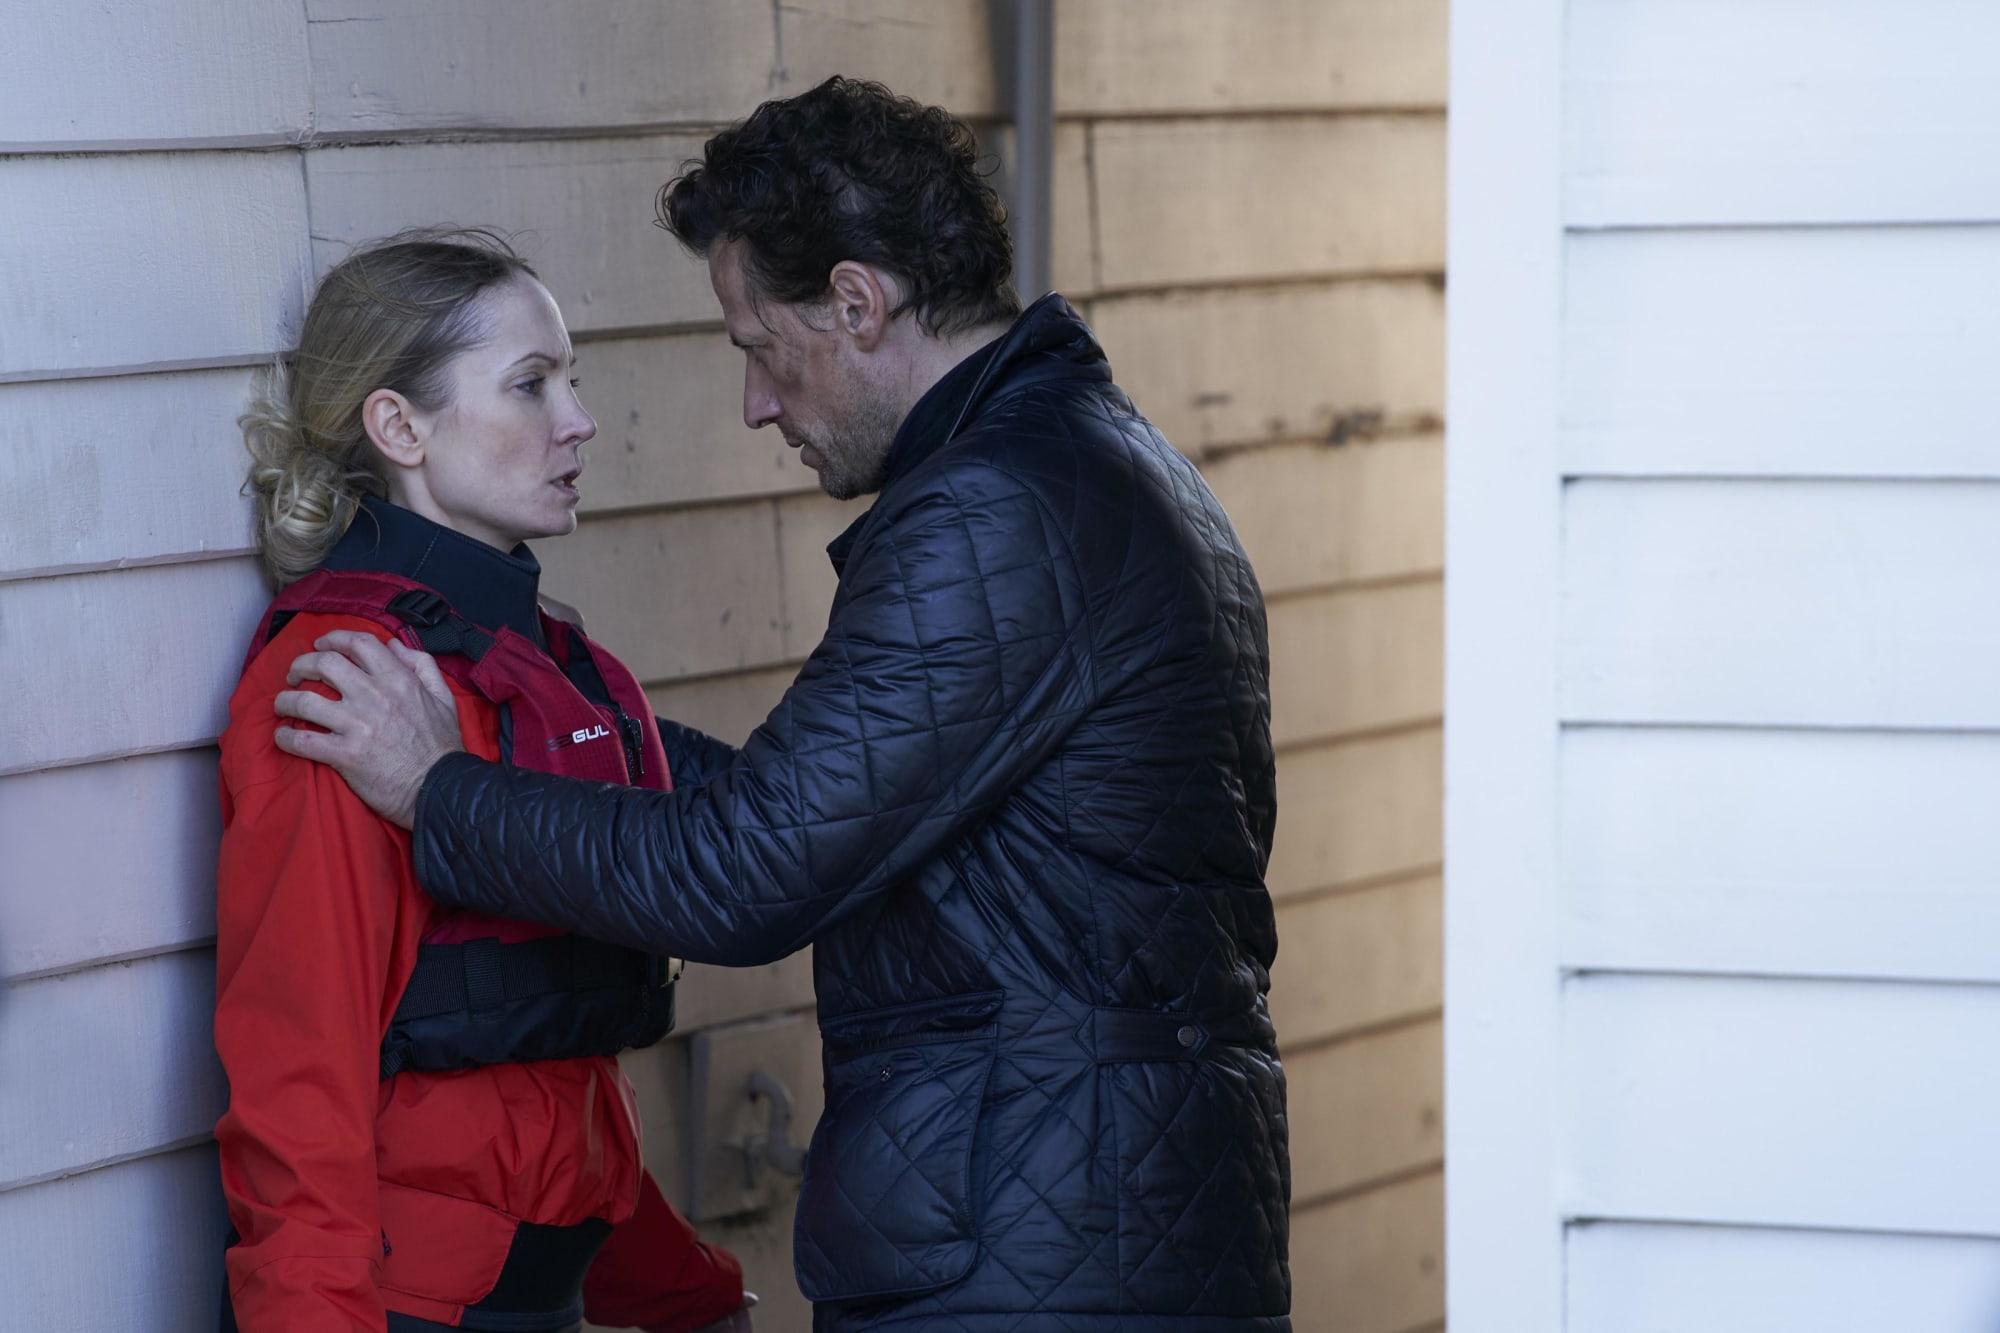 TV crime dramas on sale on Amazon this week: July 8-13, 2020